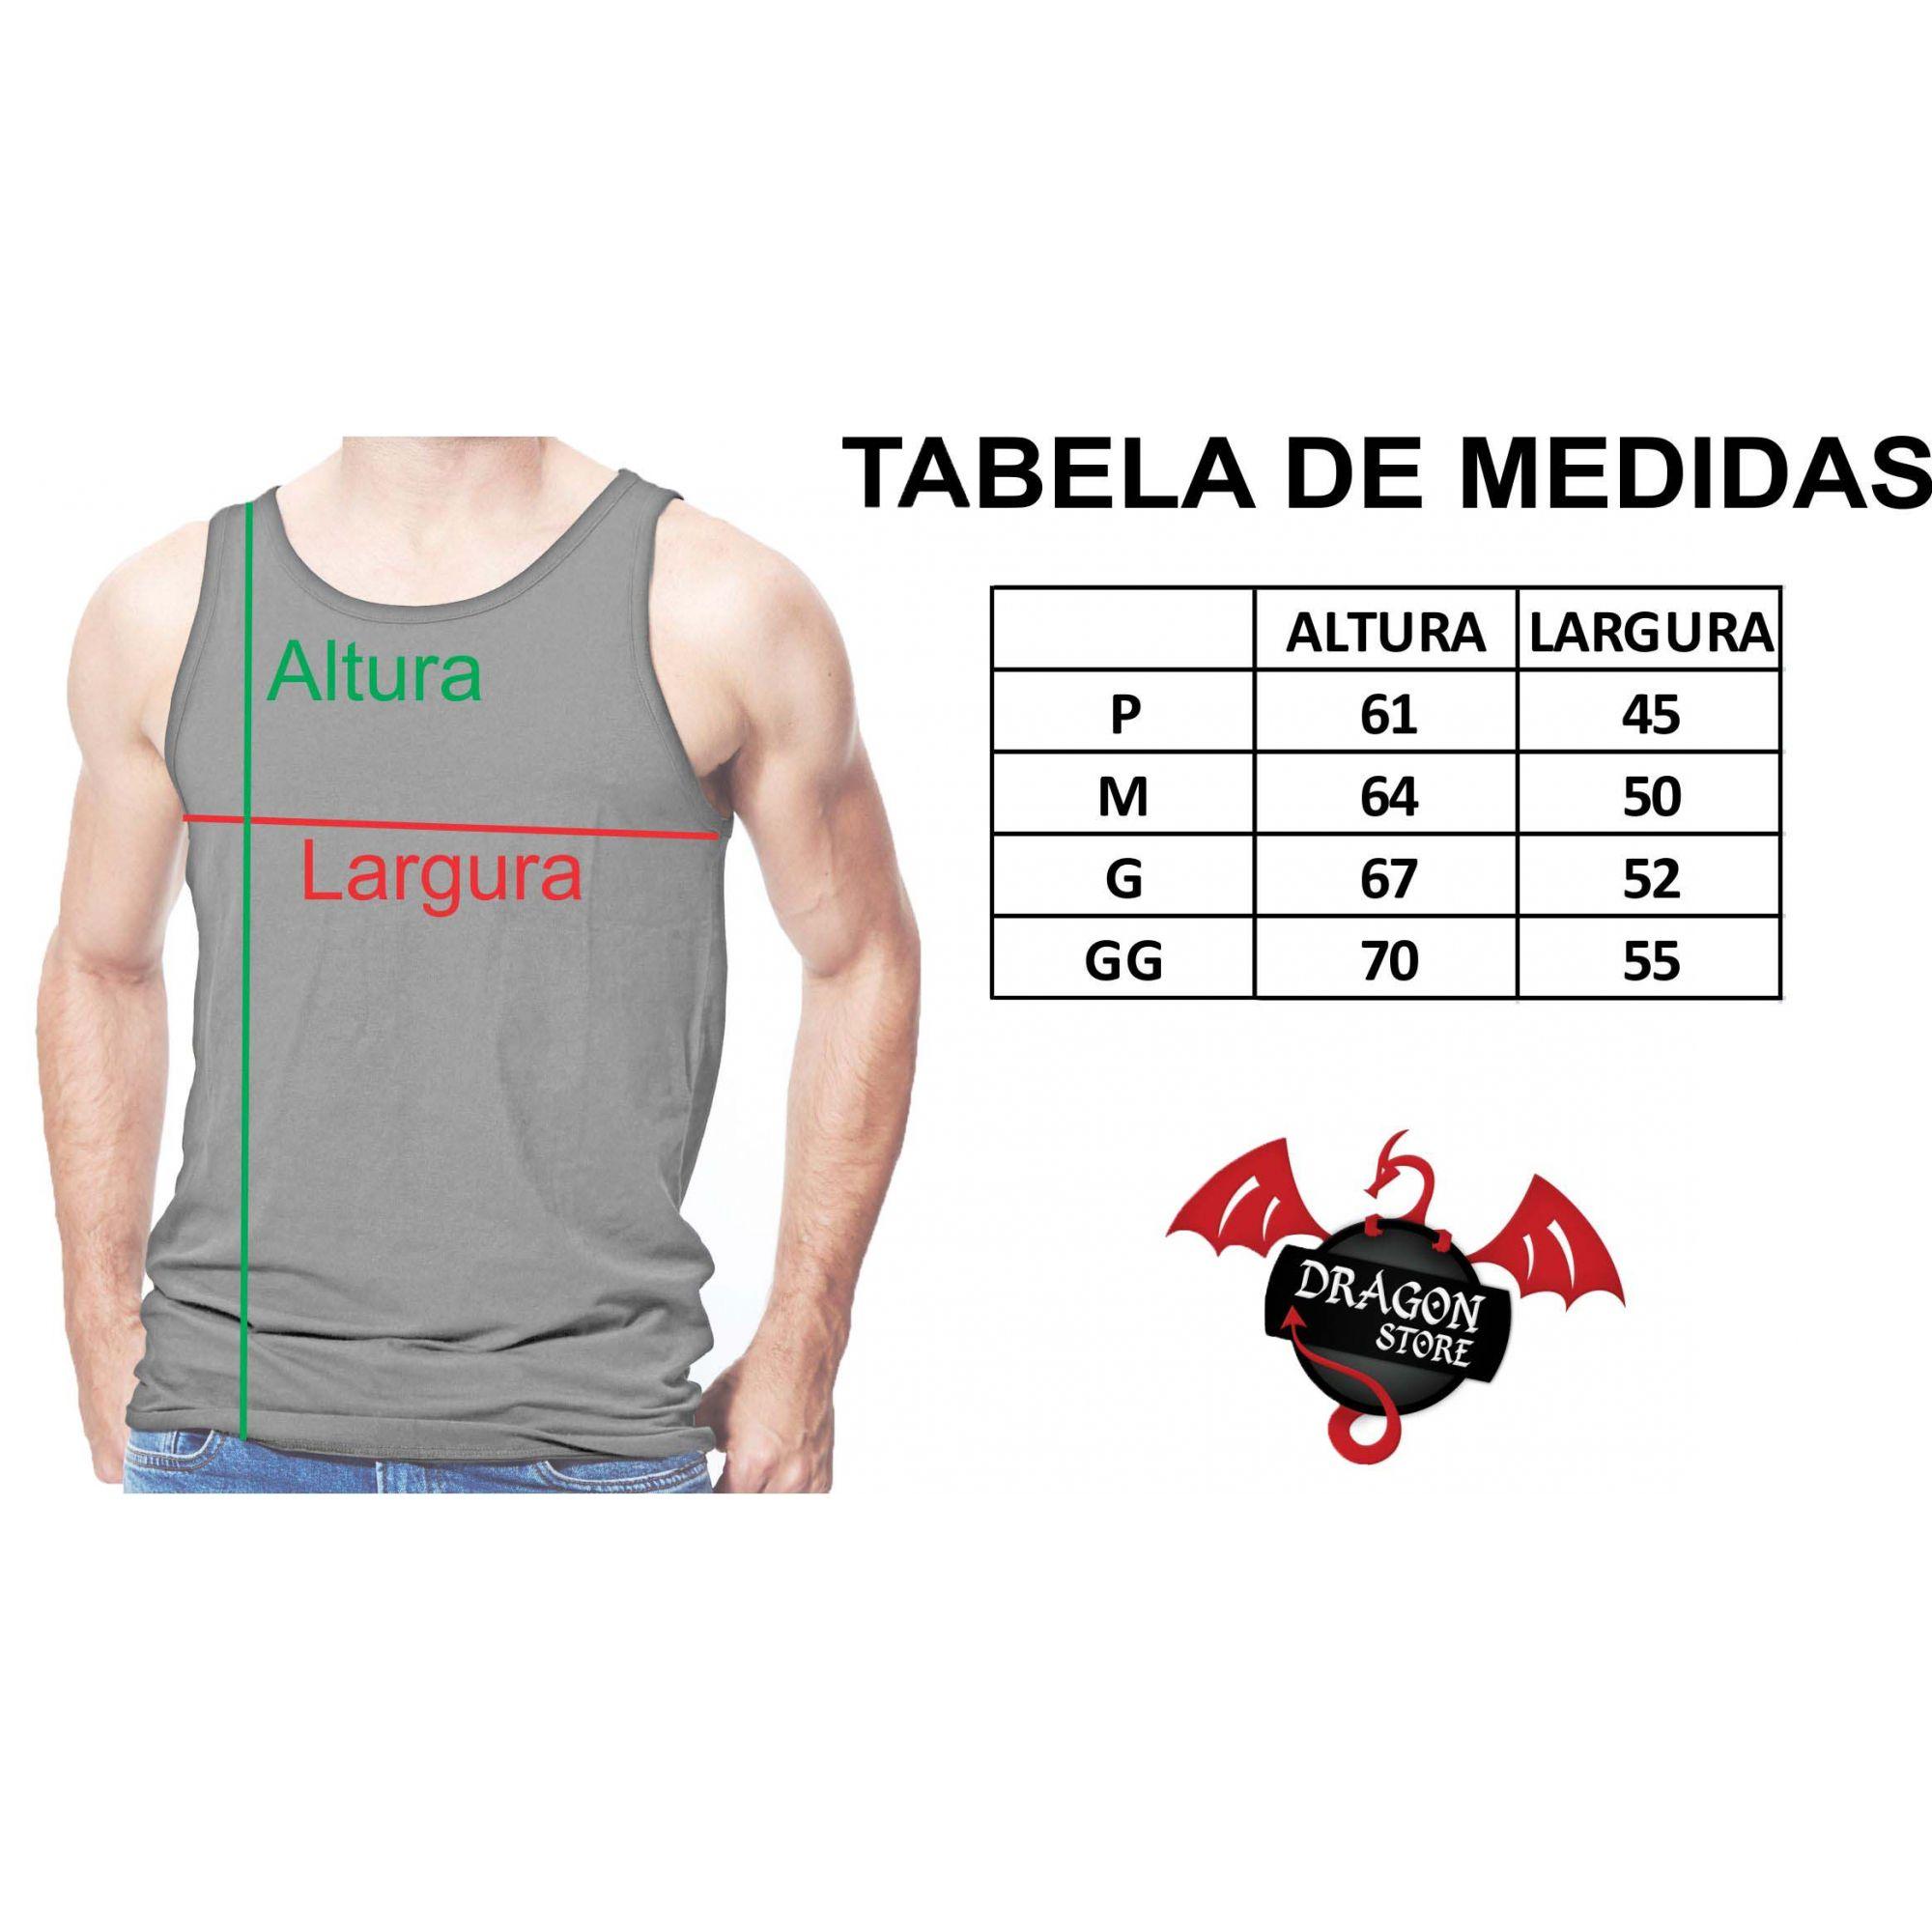 Camiseta Regata Composição Burguer Comida Lanche Hamburguer  - Dragon Store